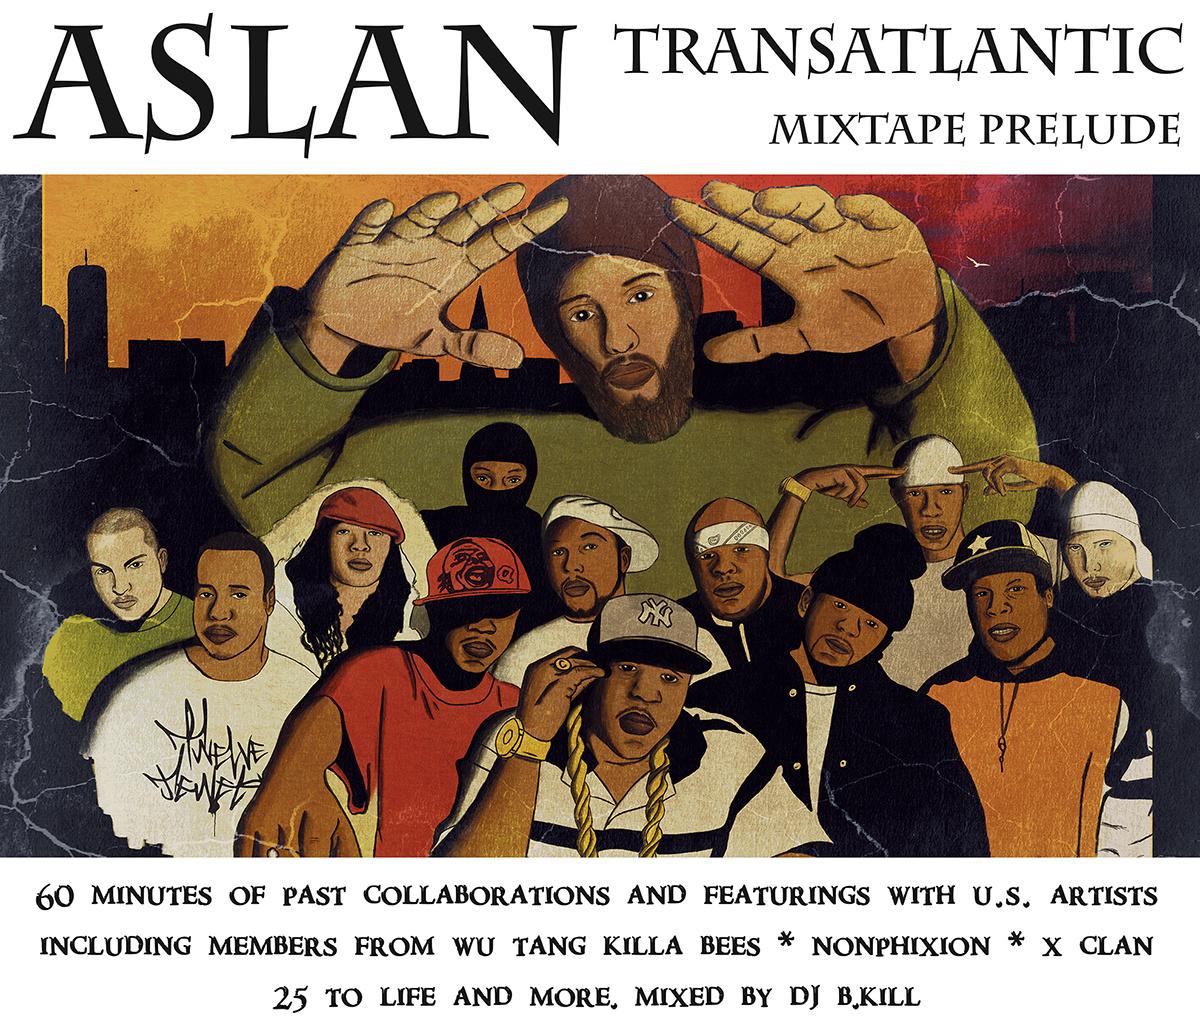 ASLAN : Transatlantic prelude mixtape